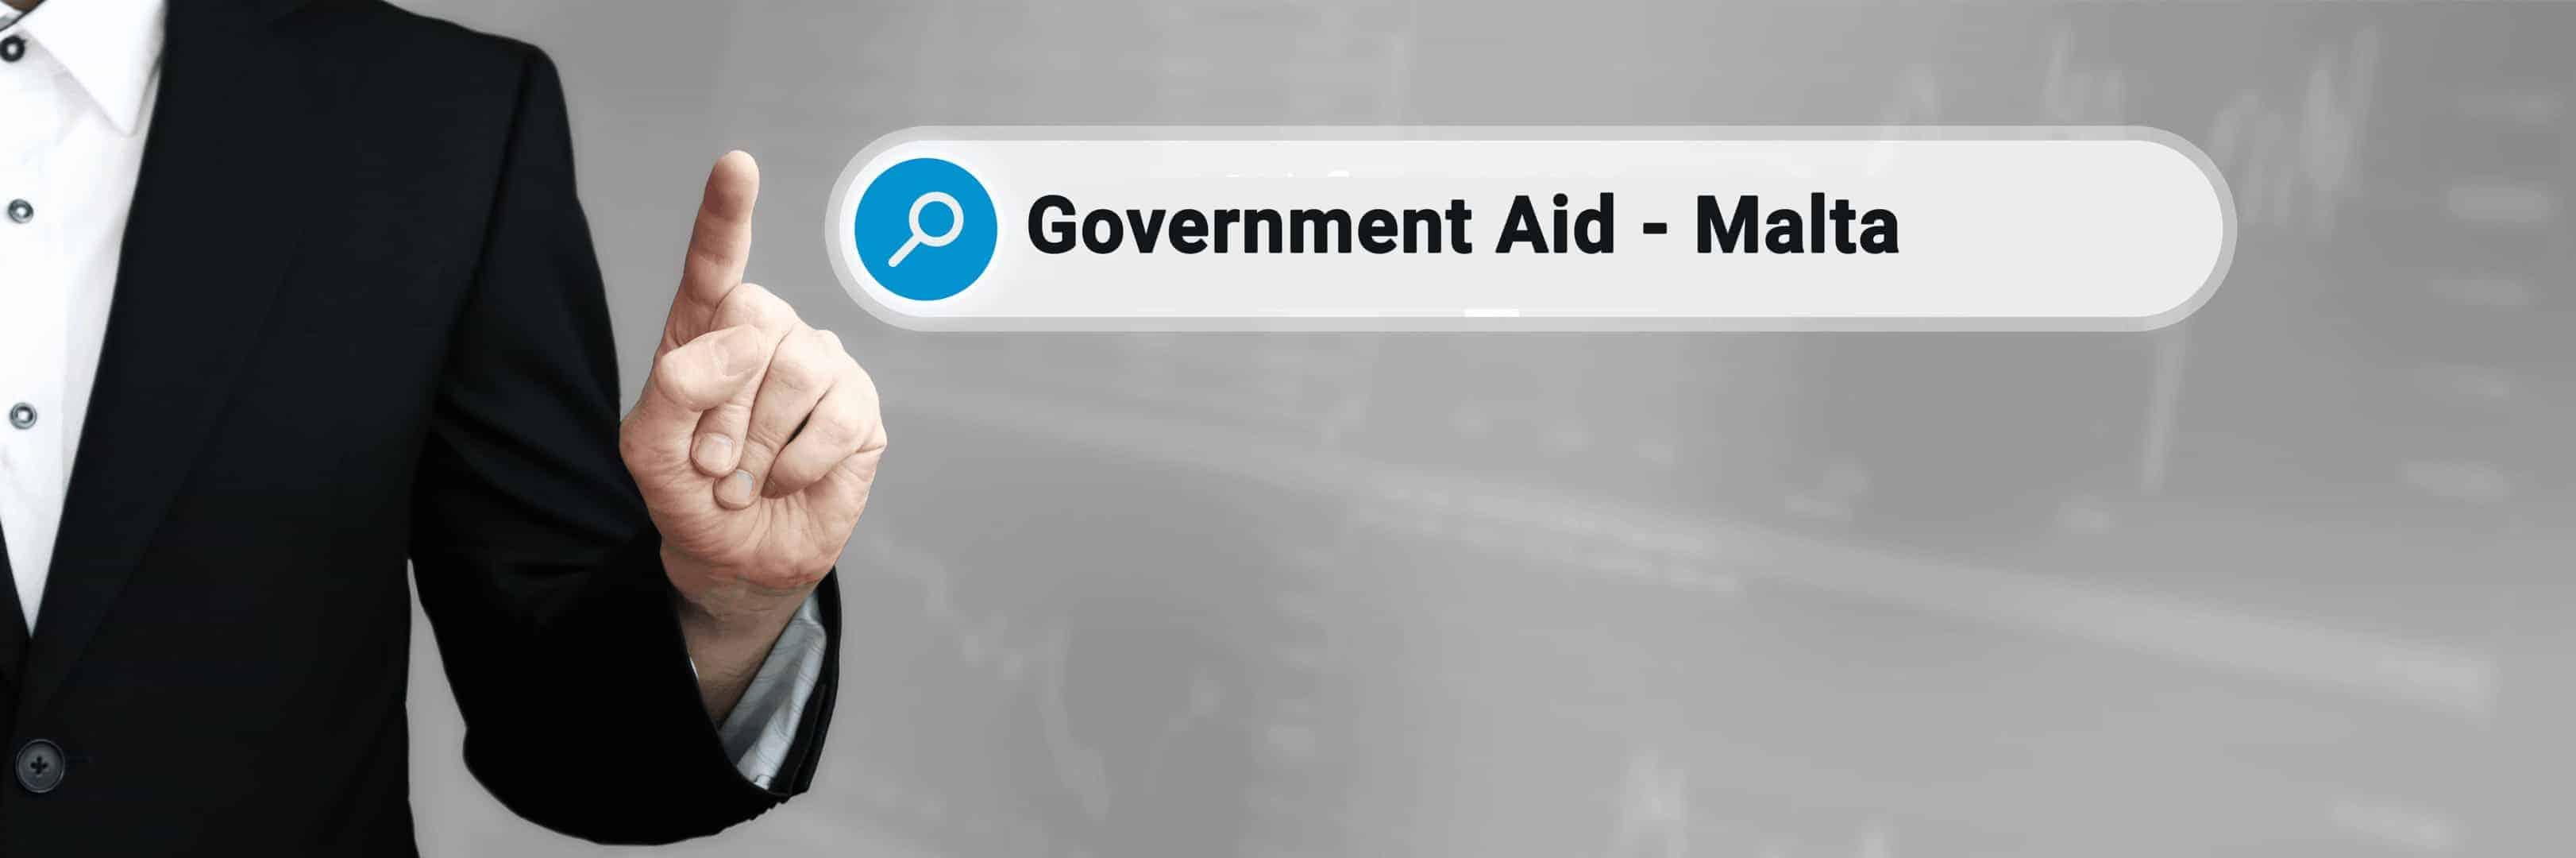 Government Aid in relation to Covid-19 - Malta